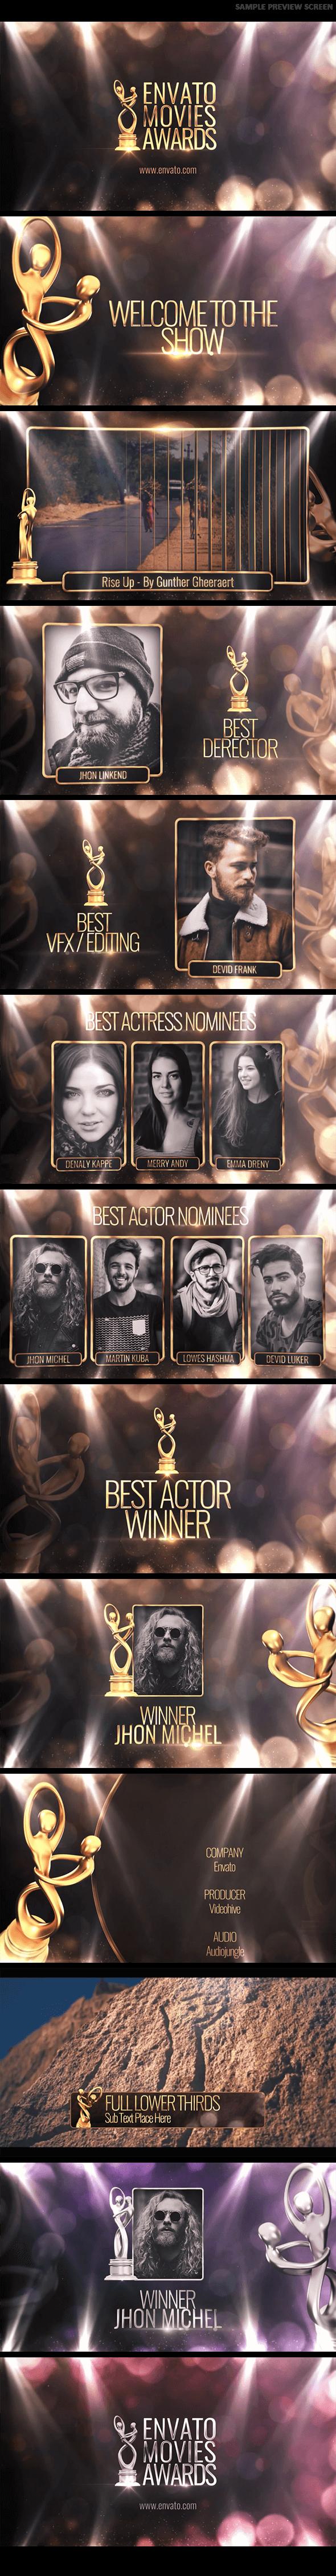 Awards_Show_02_Cover_Photo